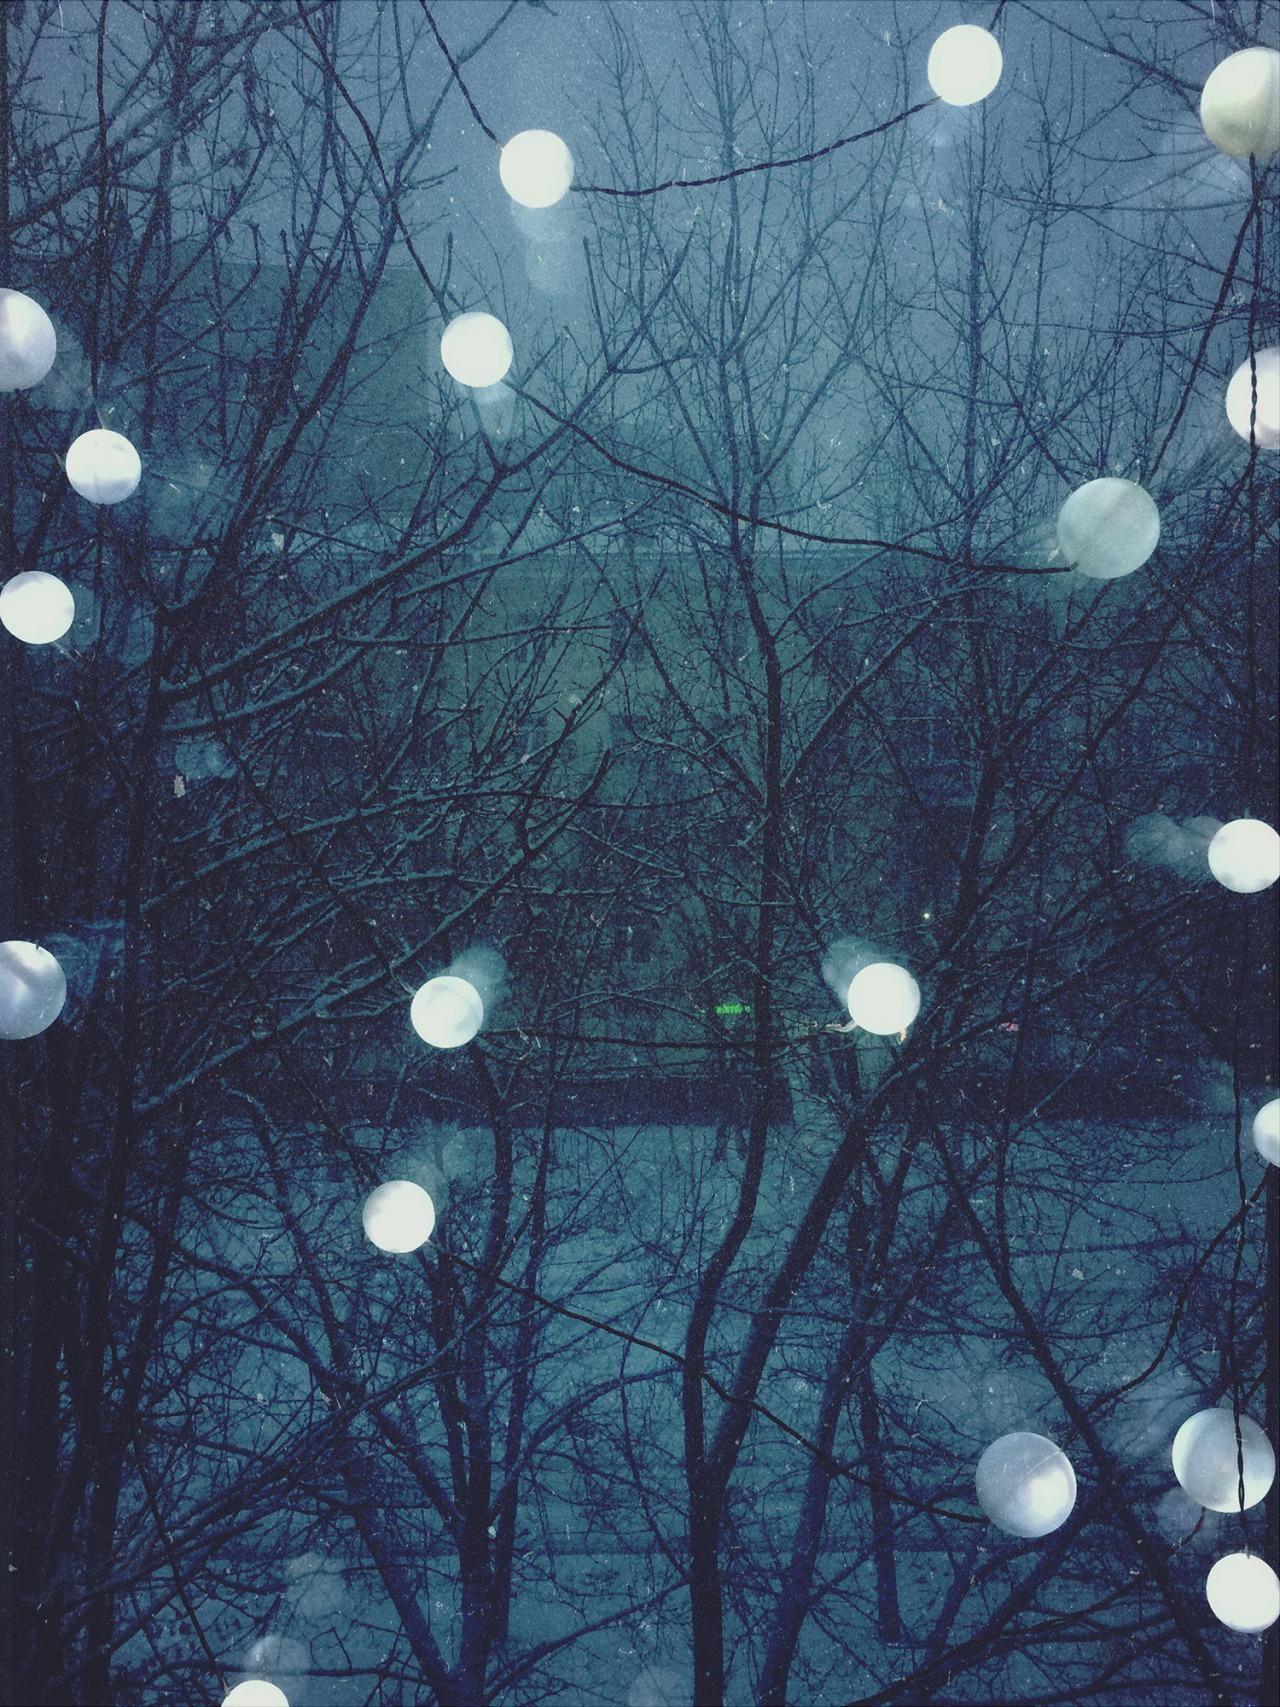 2021 | January 2, early morning Dosel❄️Christmas Lofi #lofi#Street Photography#urban photography#post soviet#eastern europe#everydayeasterneurope#winter vibes#snow #near my home #lo-fi#urban exploration#postsoviet#пятиэтажки #Краснодонская ул. 18/18 #winter#christmas#christmas vibes#lights